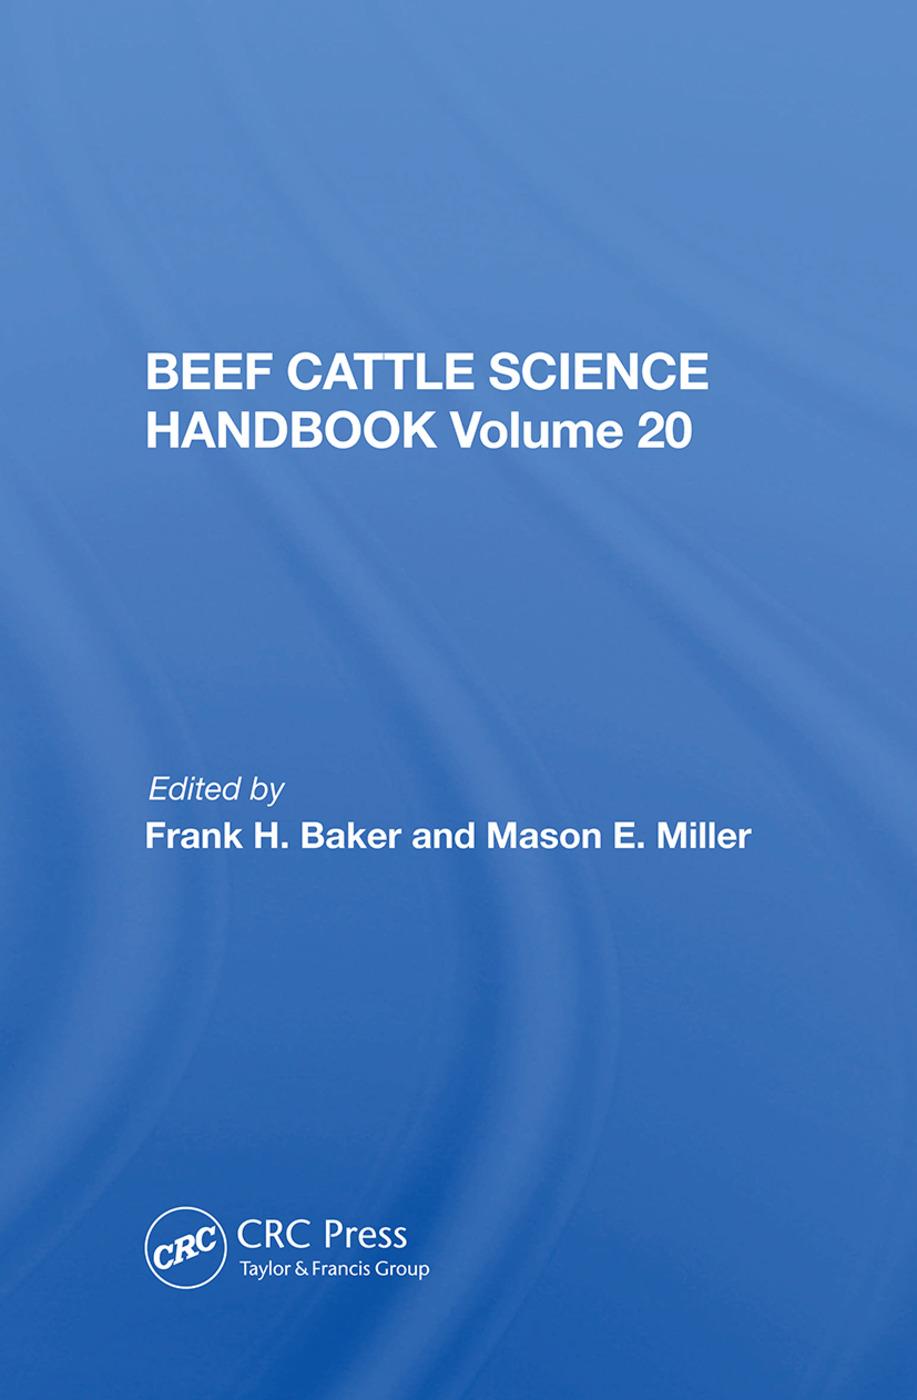 Beef Cattle Science Handbook, Vol. 20: 1st Edition (Hardback) book cover